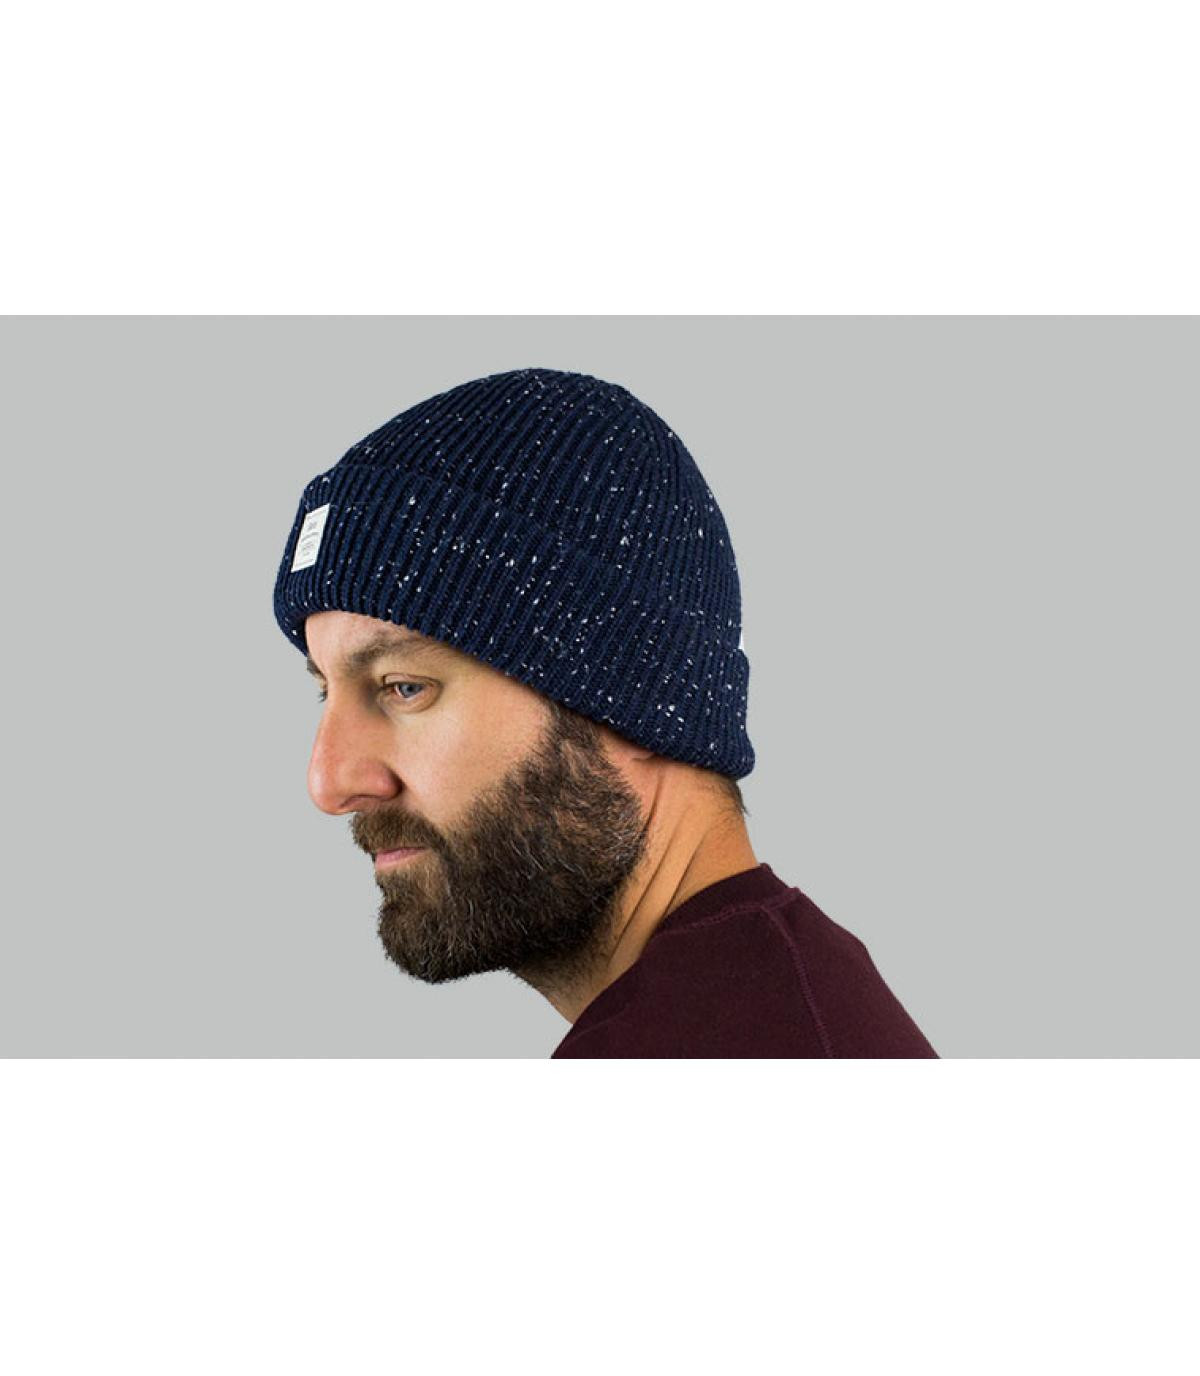 Mütze mit Rand blau Barts